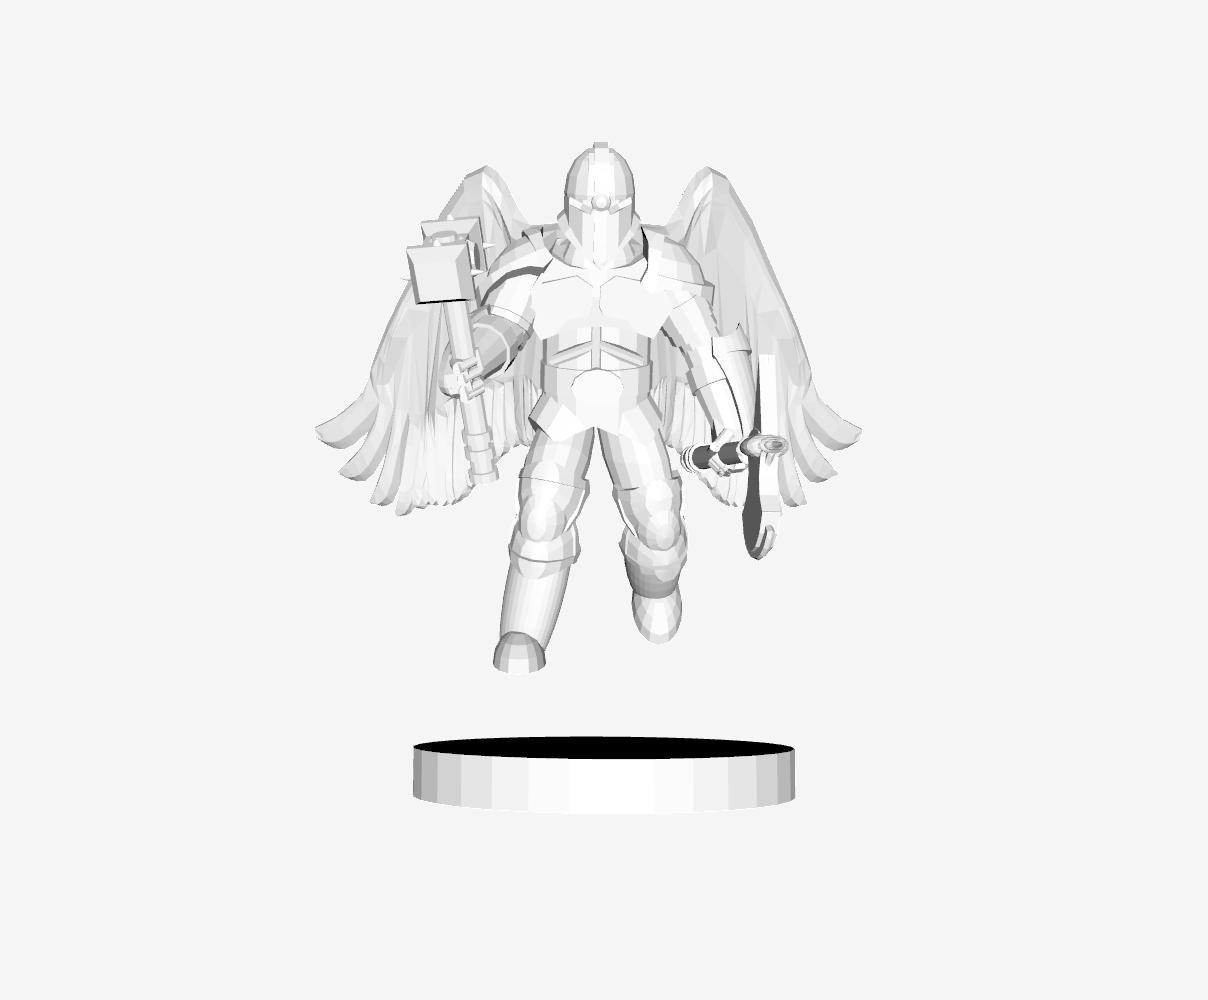 Capture d'écran 2018-08-02 à 10.55.18.png Download free STL file Angel Warrior • 3D printer model, mrhers2